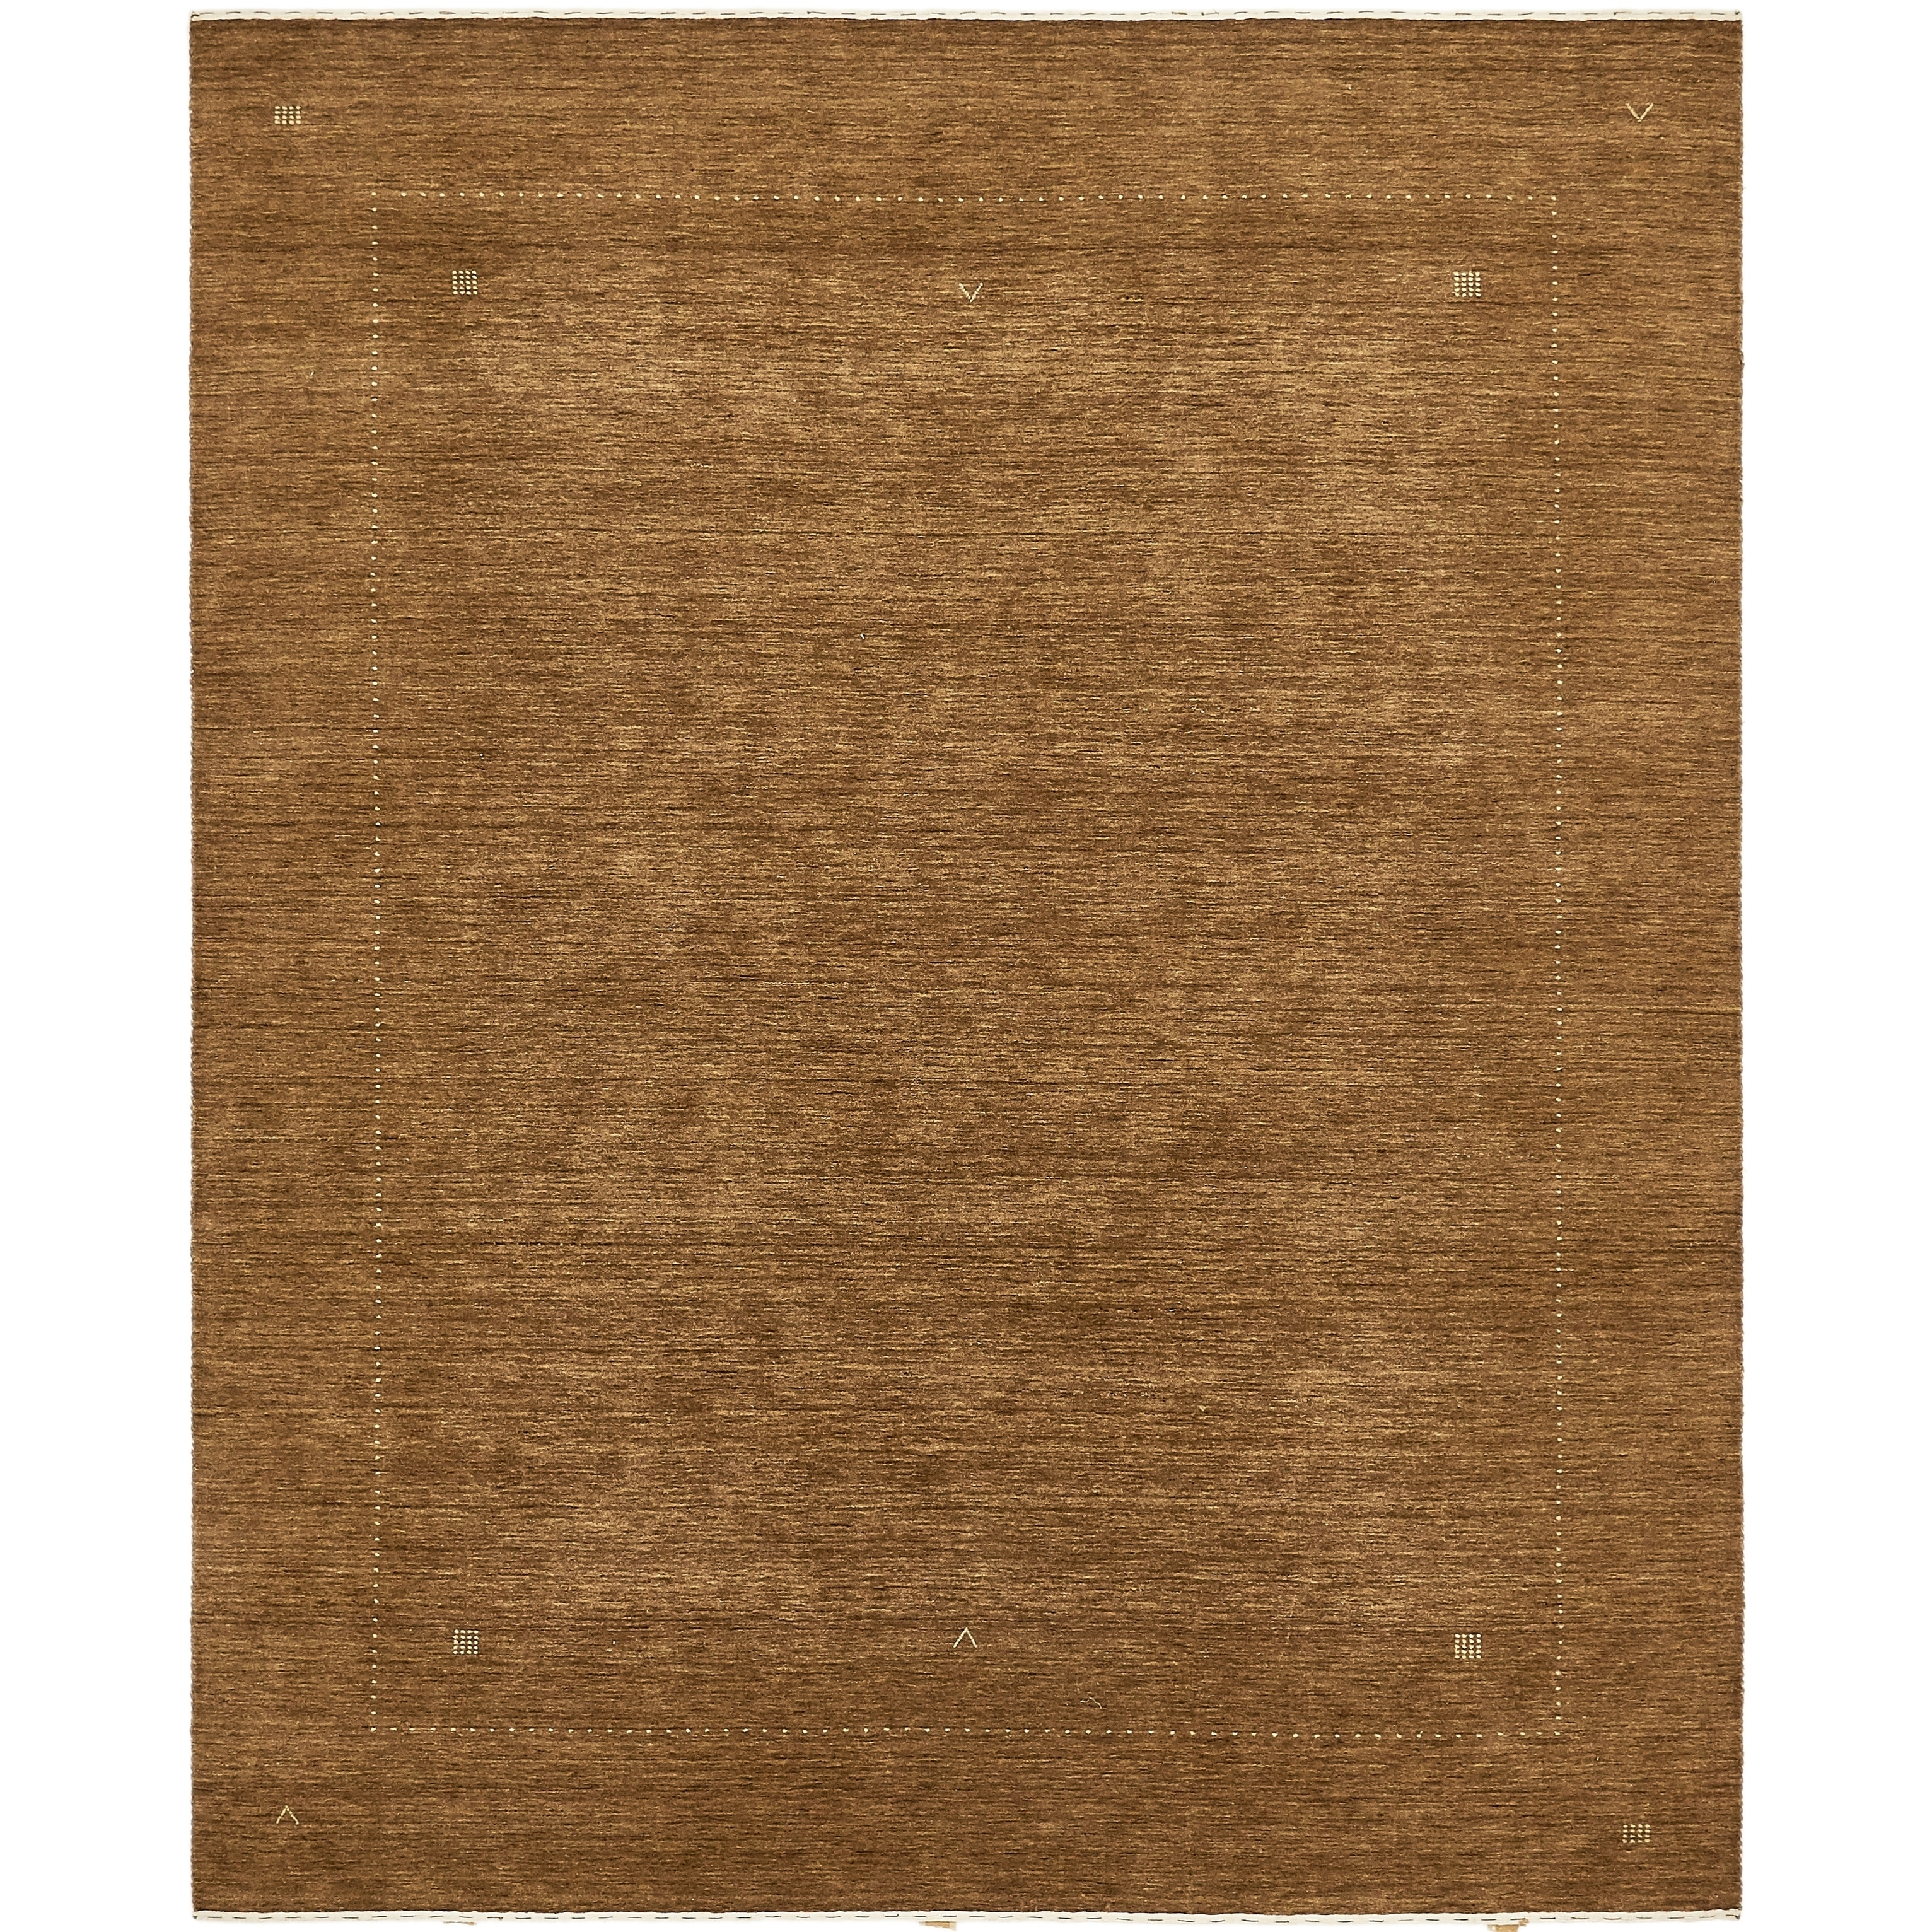 Hand Knotted Kashkuli Gabbeh Wool Area Rug - 8 x 10 (Brown - 8 x 10)